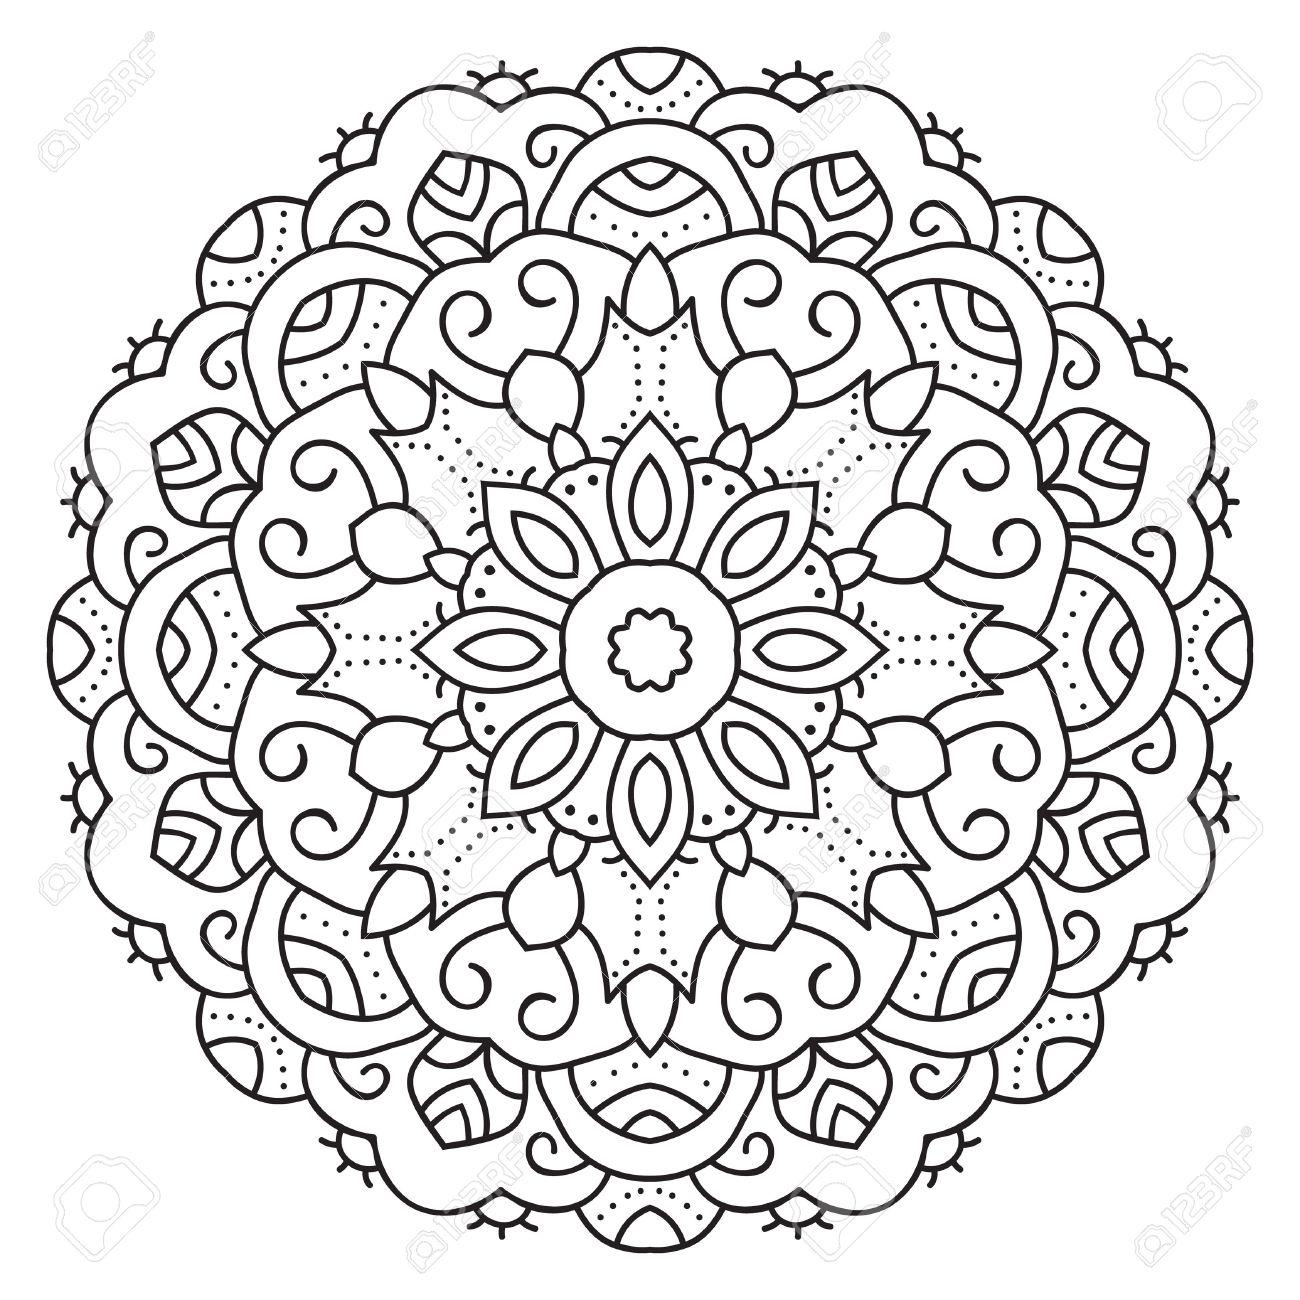 Simétrica Mandala Patrón Circular. Modelo Oriental Decorativo